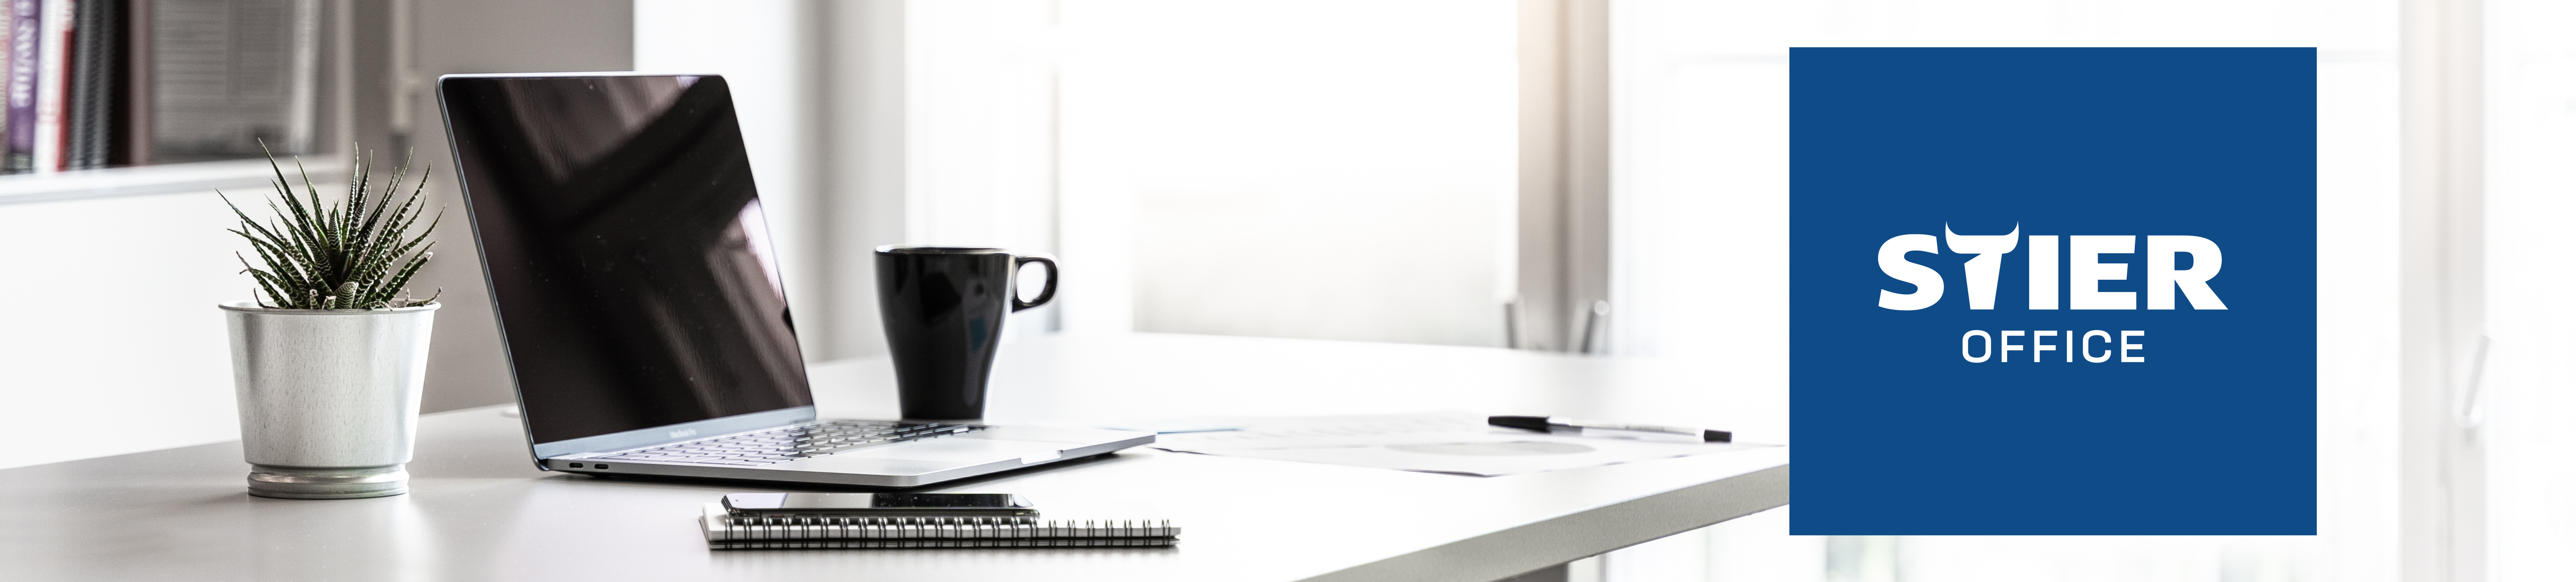 STIER Office Online Shop |